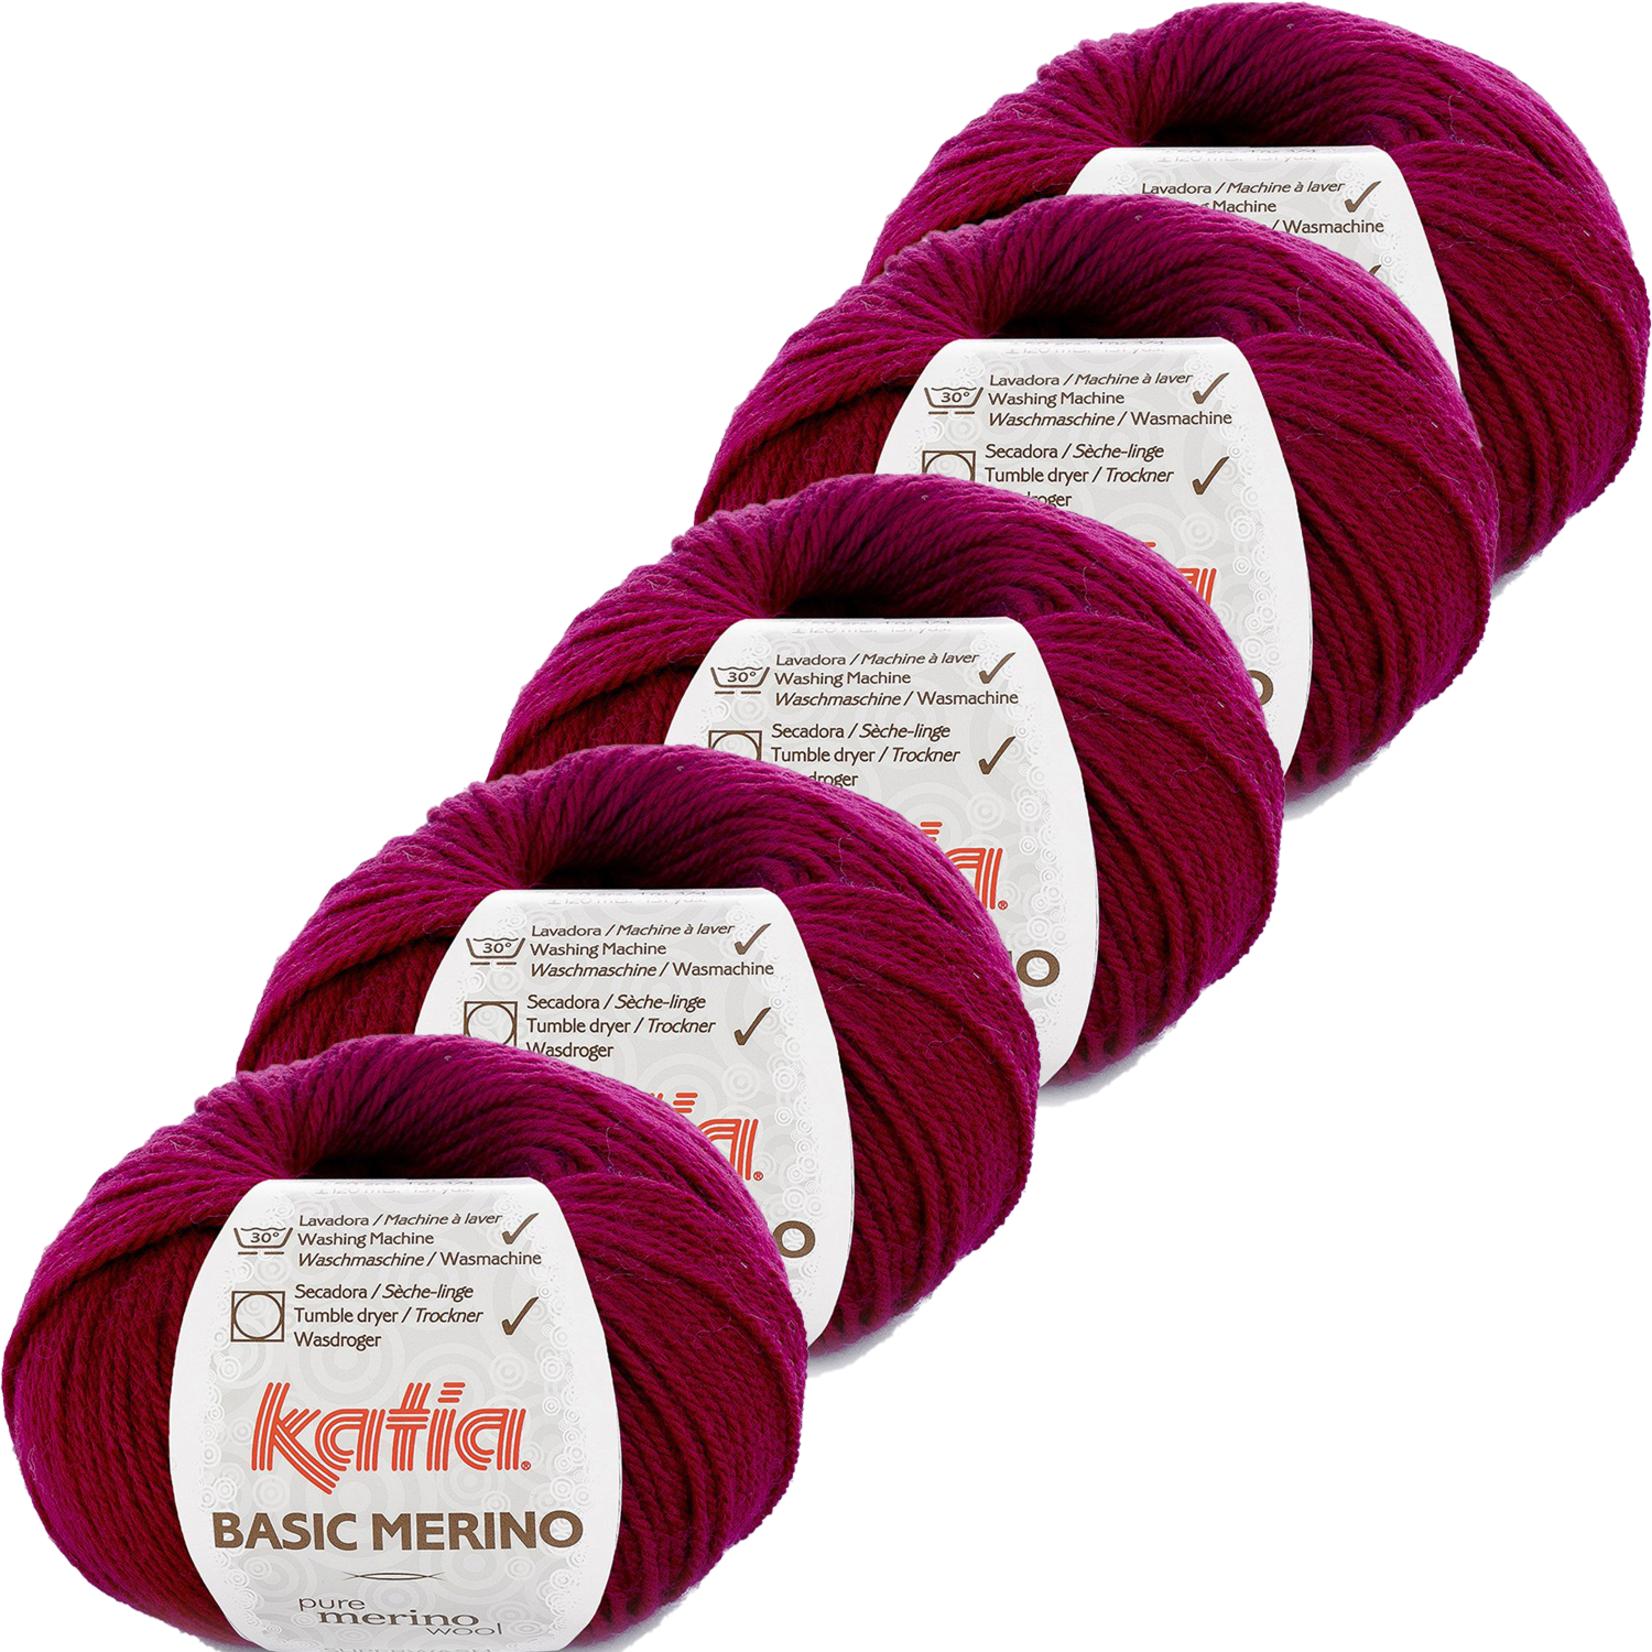 Katia Basic Merino - kleur 24_Donker fuchsia - bundel 5 bollen 50 gr.  van 120 m.